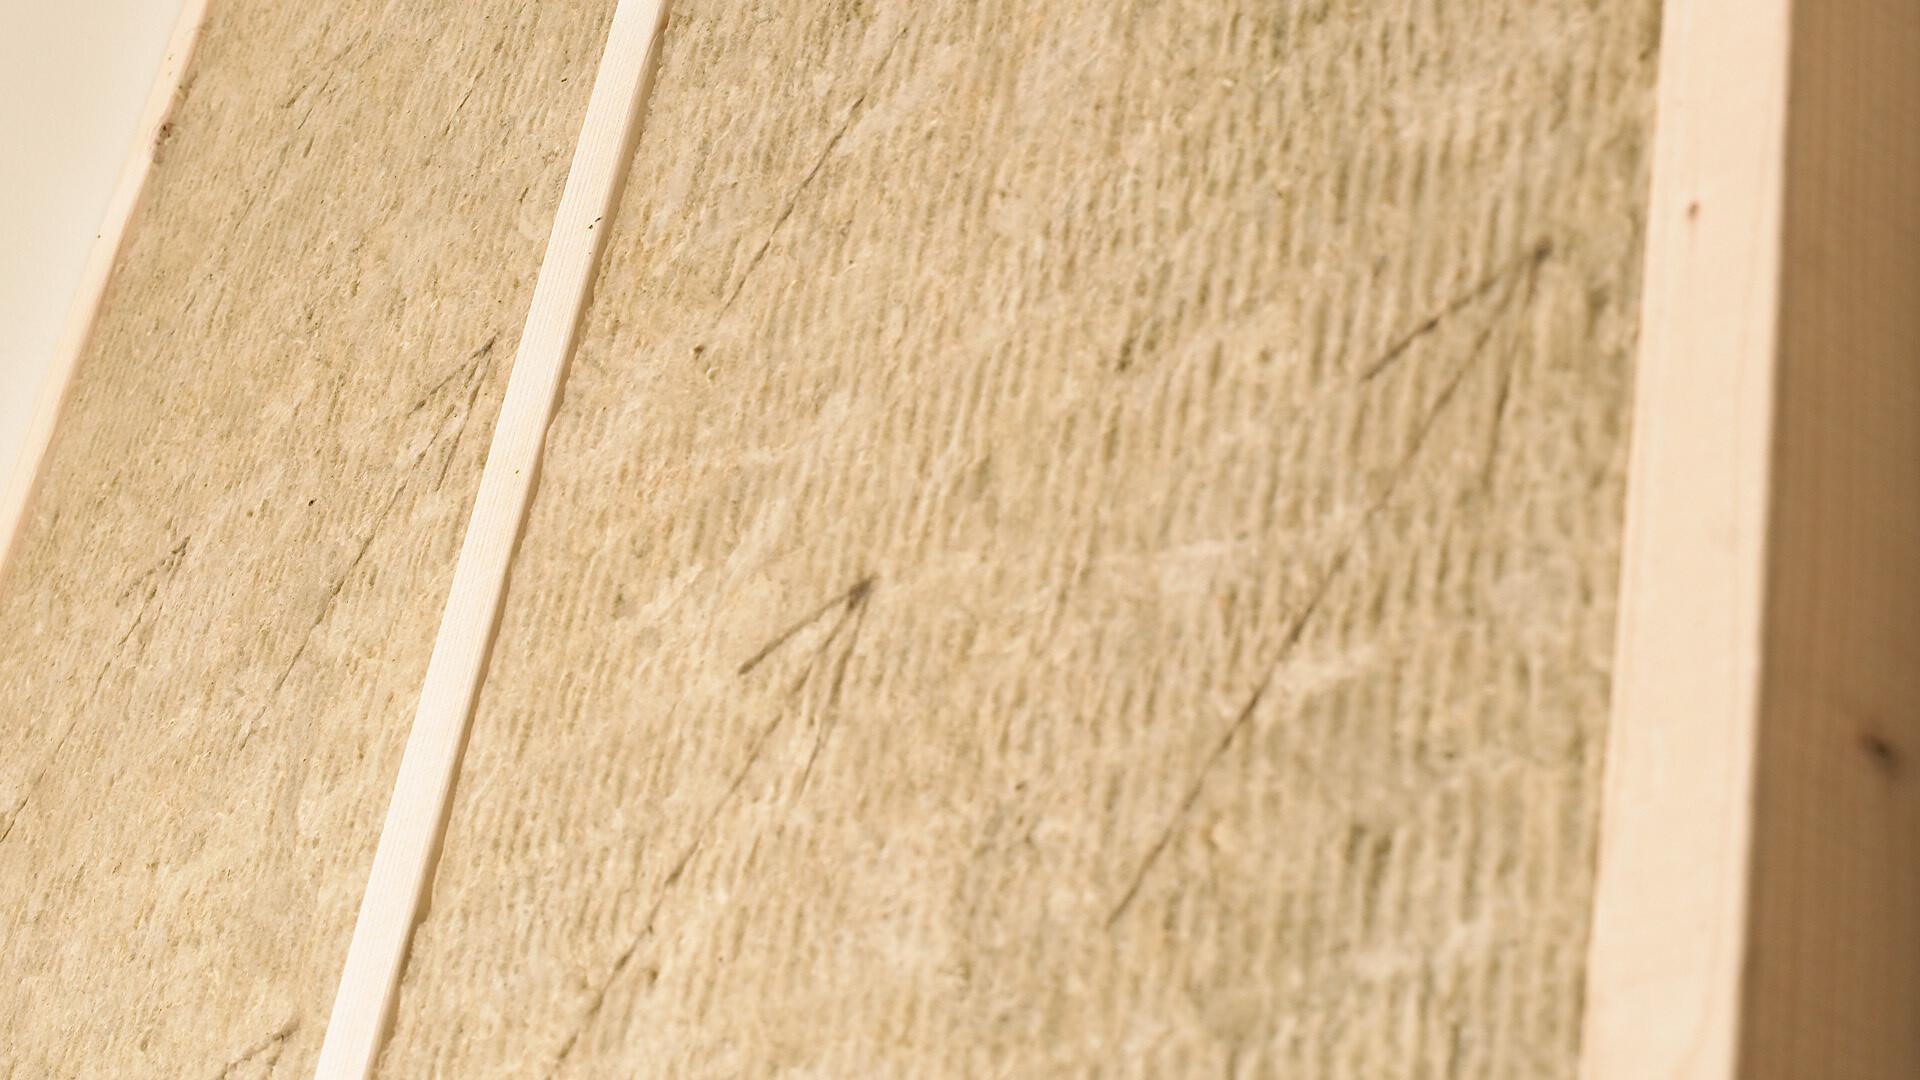 rocksono, base, vario, houten profielen, wall insulation, wooden profile